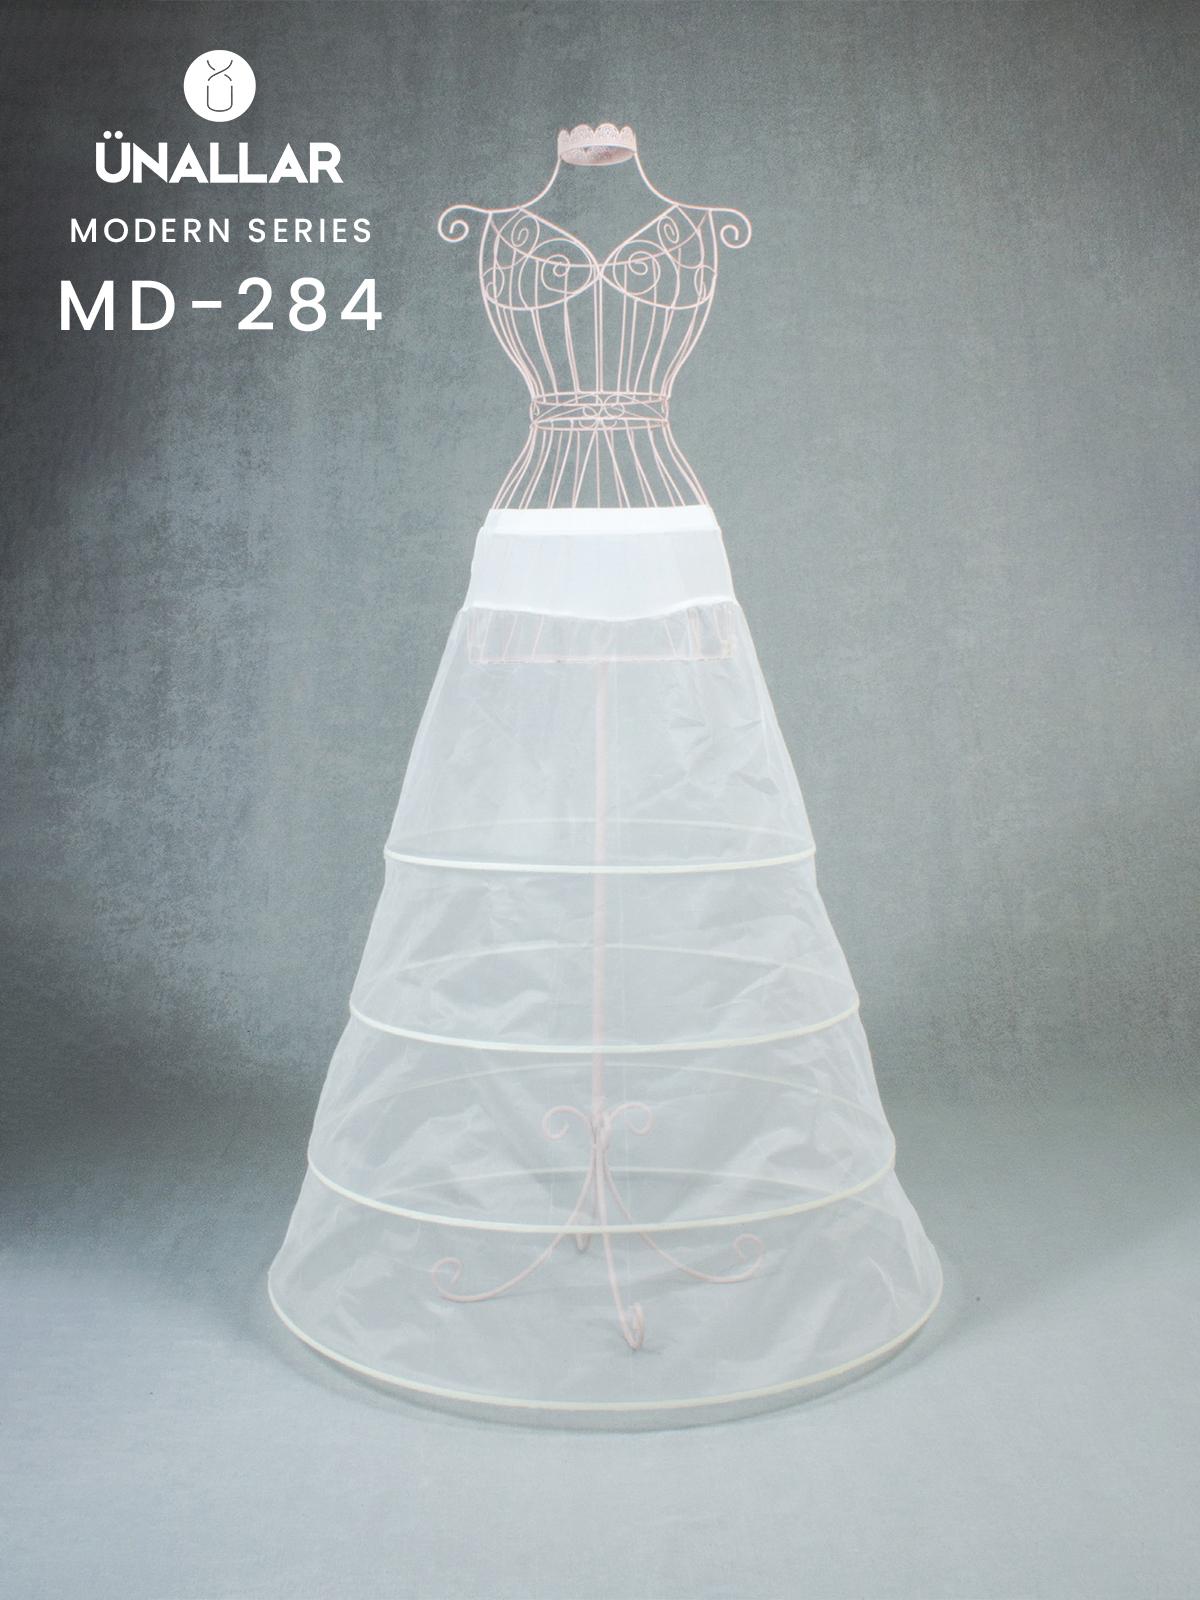 md-284